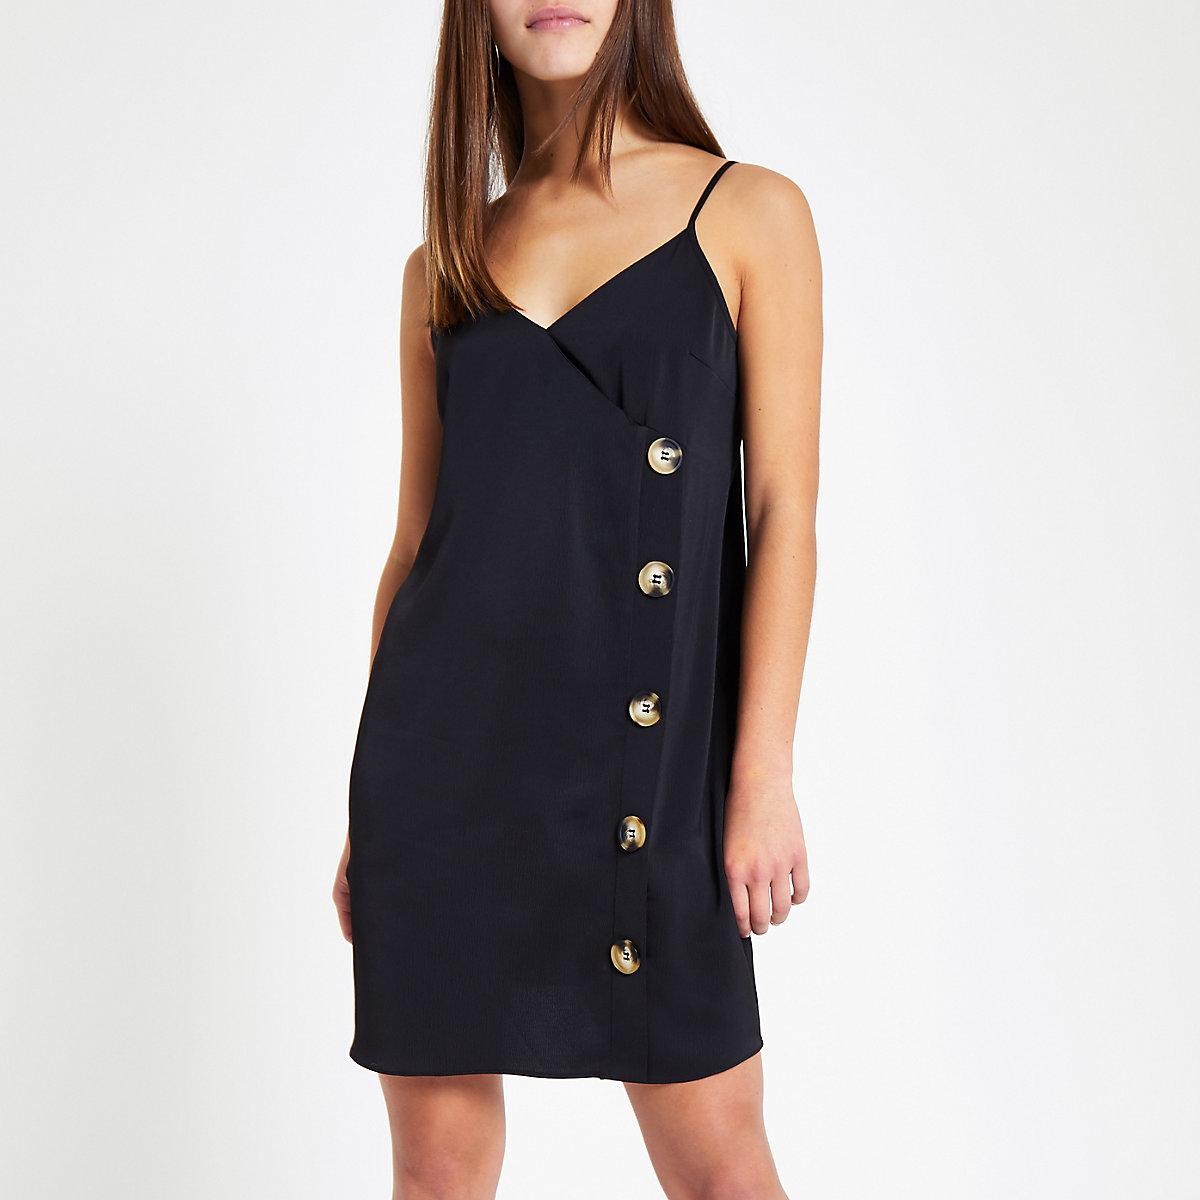 Petite black satin loose fit cami dress